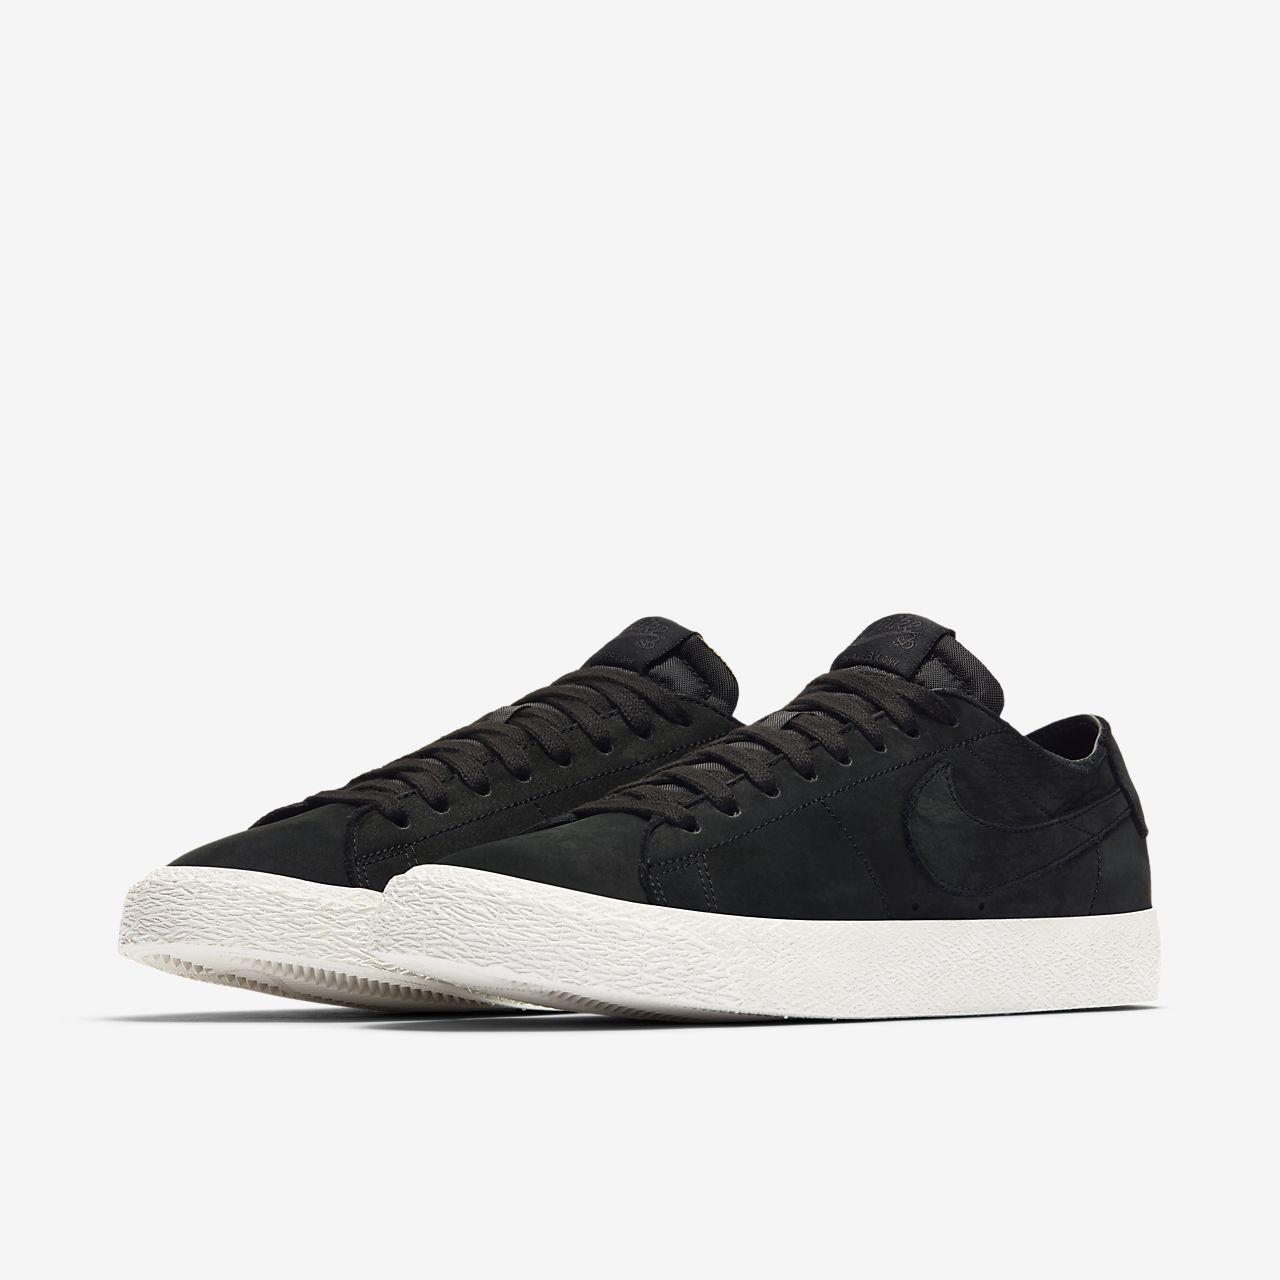 ... Chaussure de skateboard Nike SB Zoom Blazer Low Deconstructed pour Homme